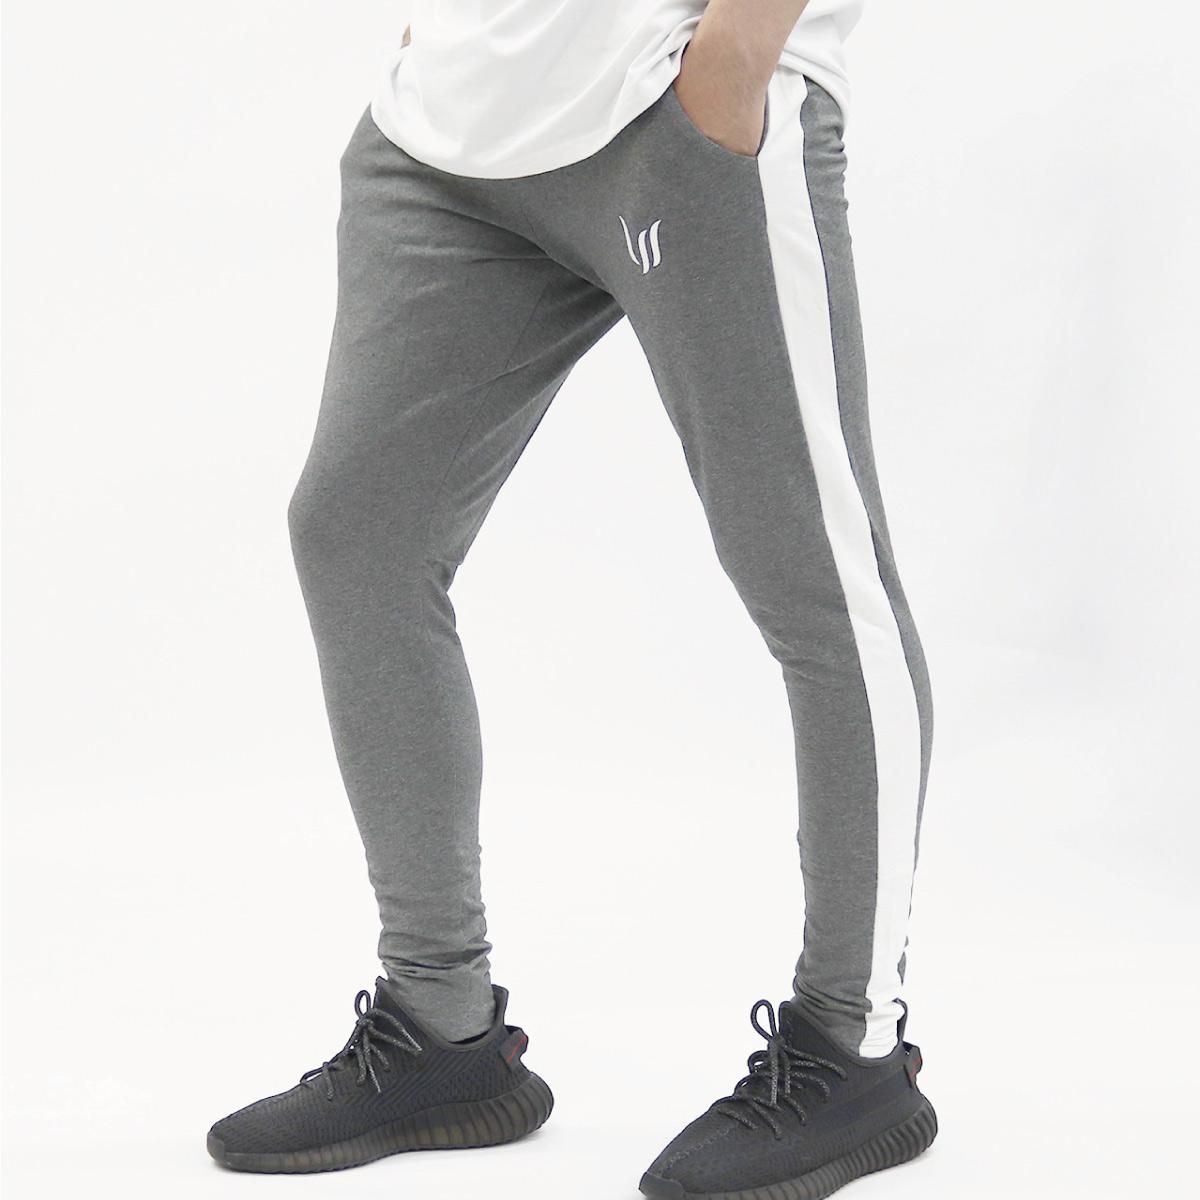 JOGGERS PANTS - CHARCOAL GRAY/WHITE